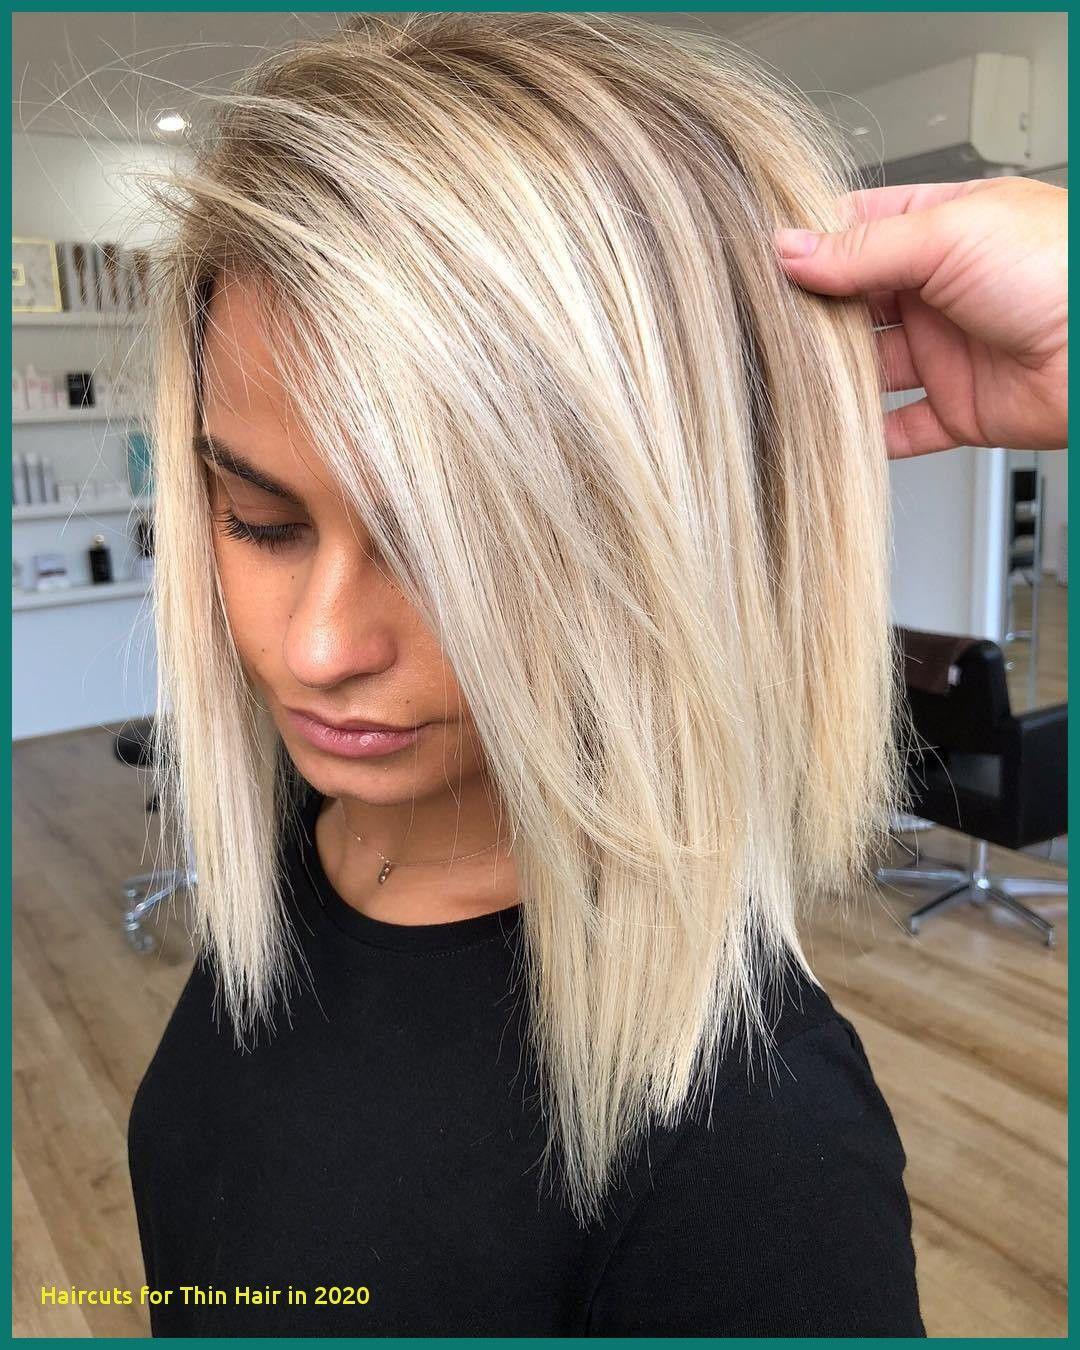 97 Amazing Haircuts For Thin Hair In 2020 Hair Styles Hair Lengths Medium Length Hair Styles